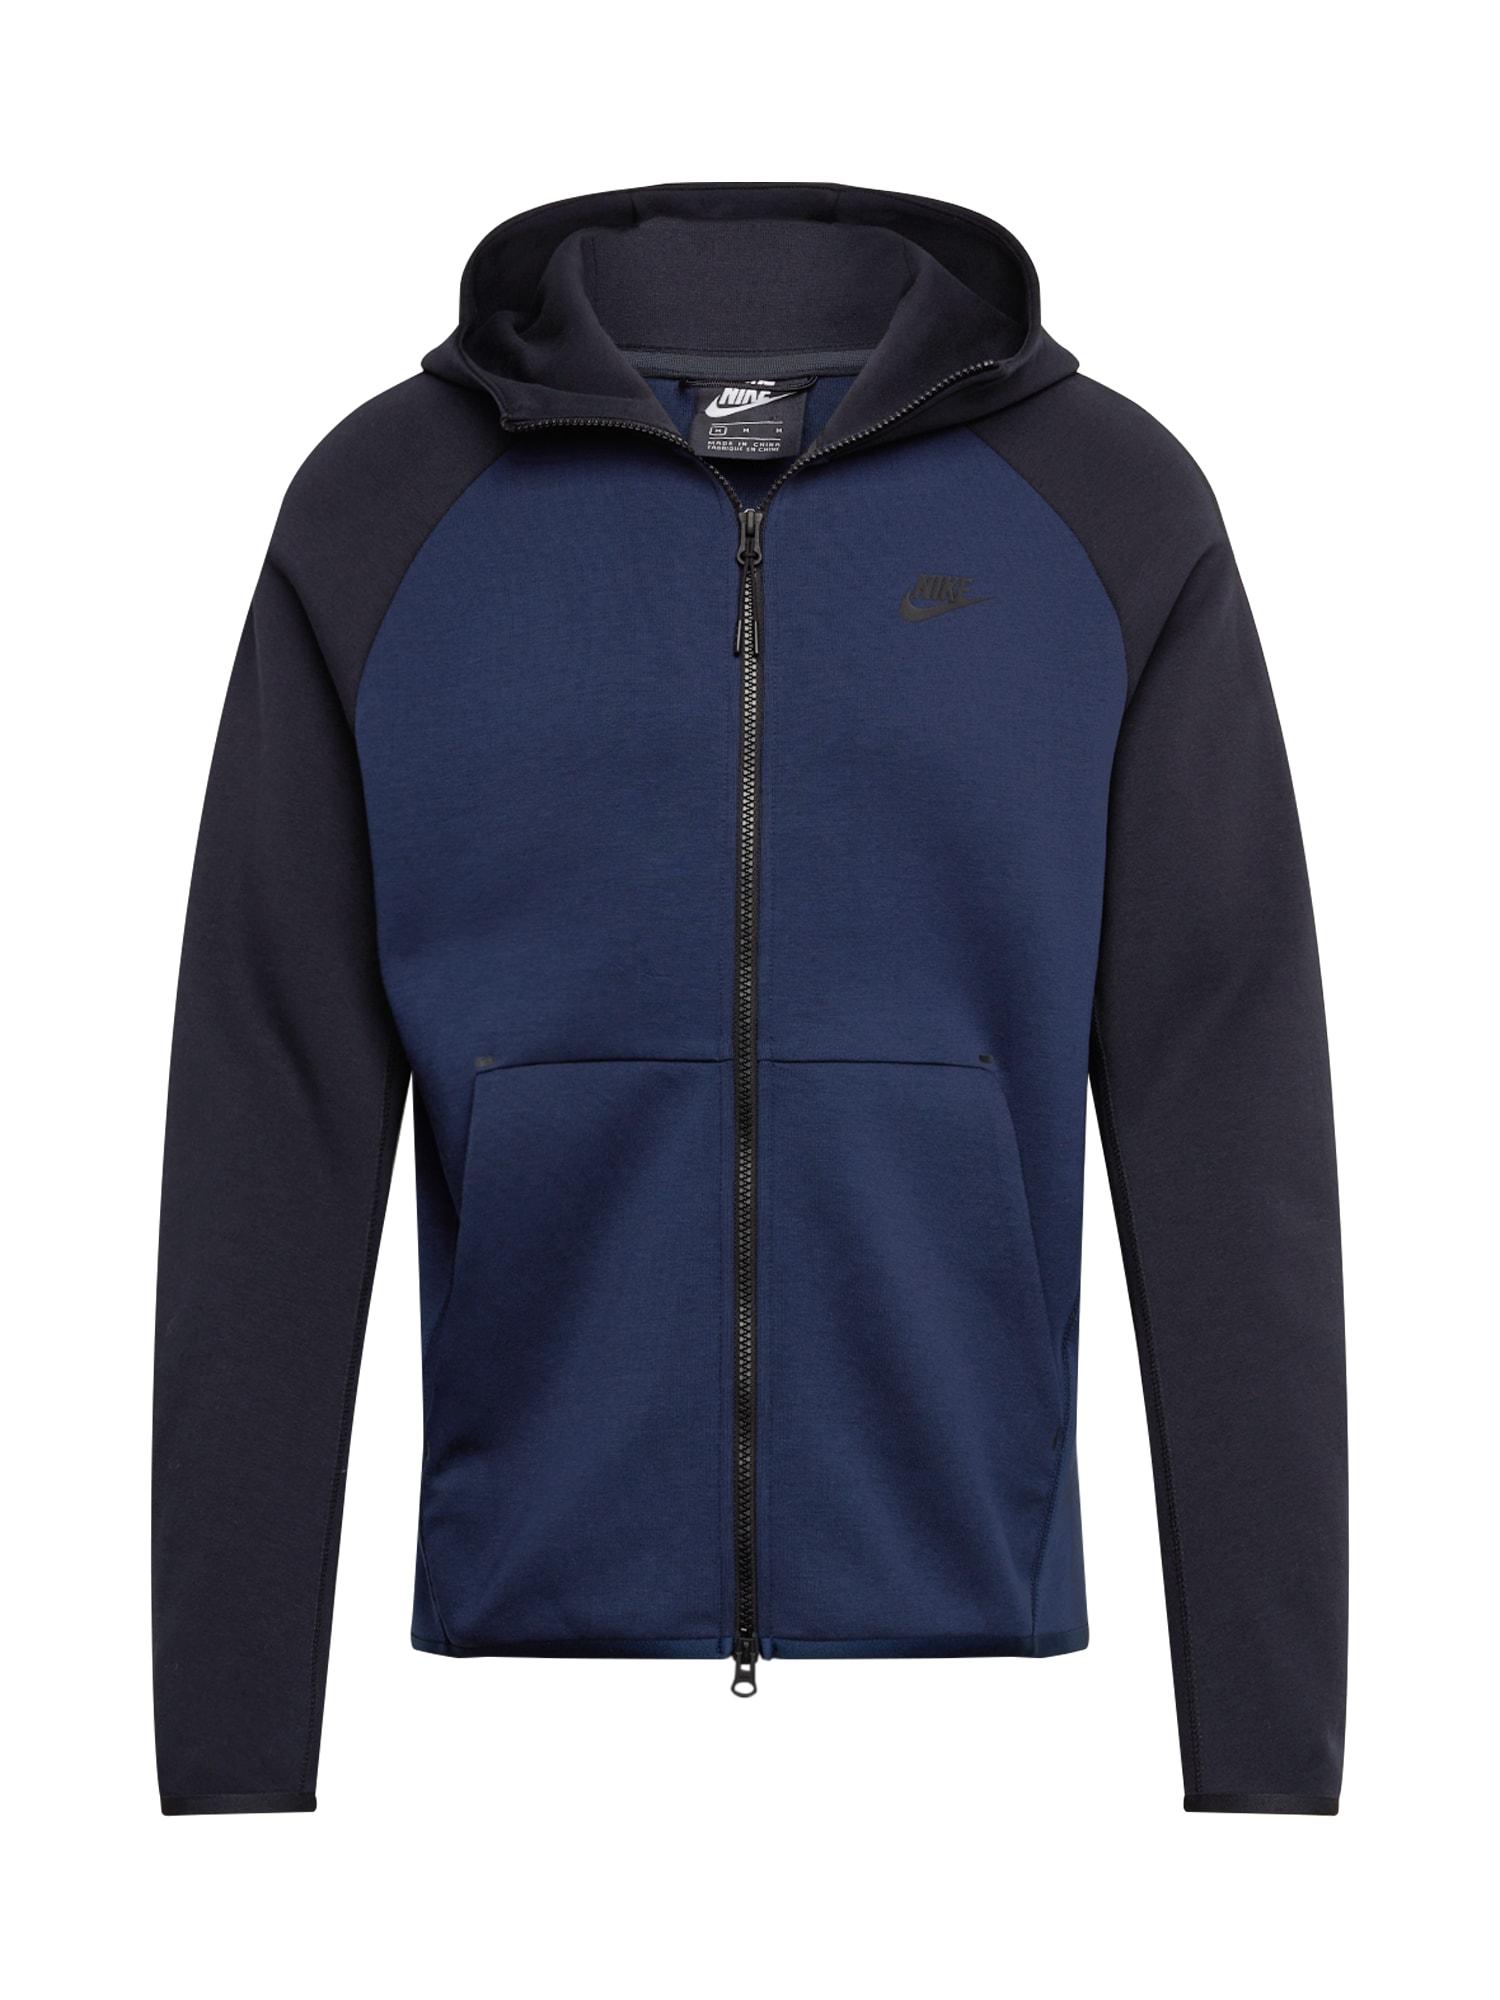 Nike Sportswear Džemperis juoda / tamsiai mėlyna